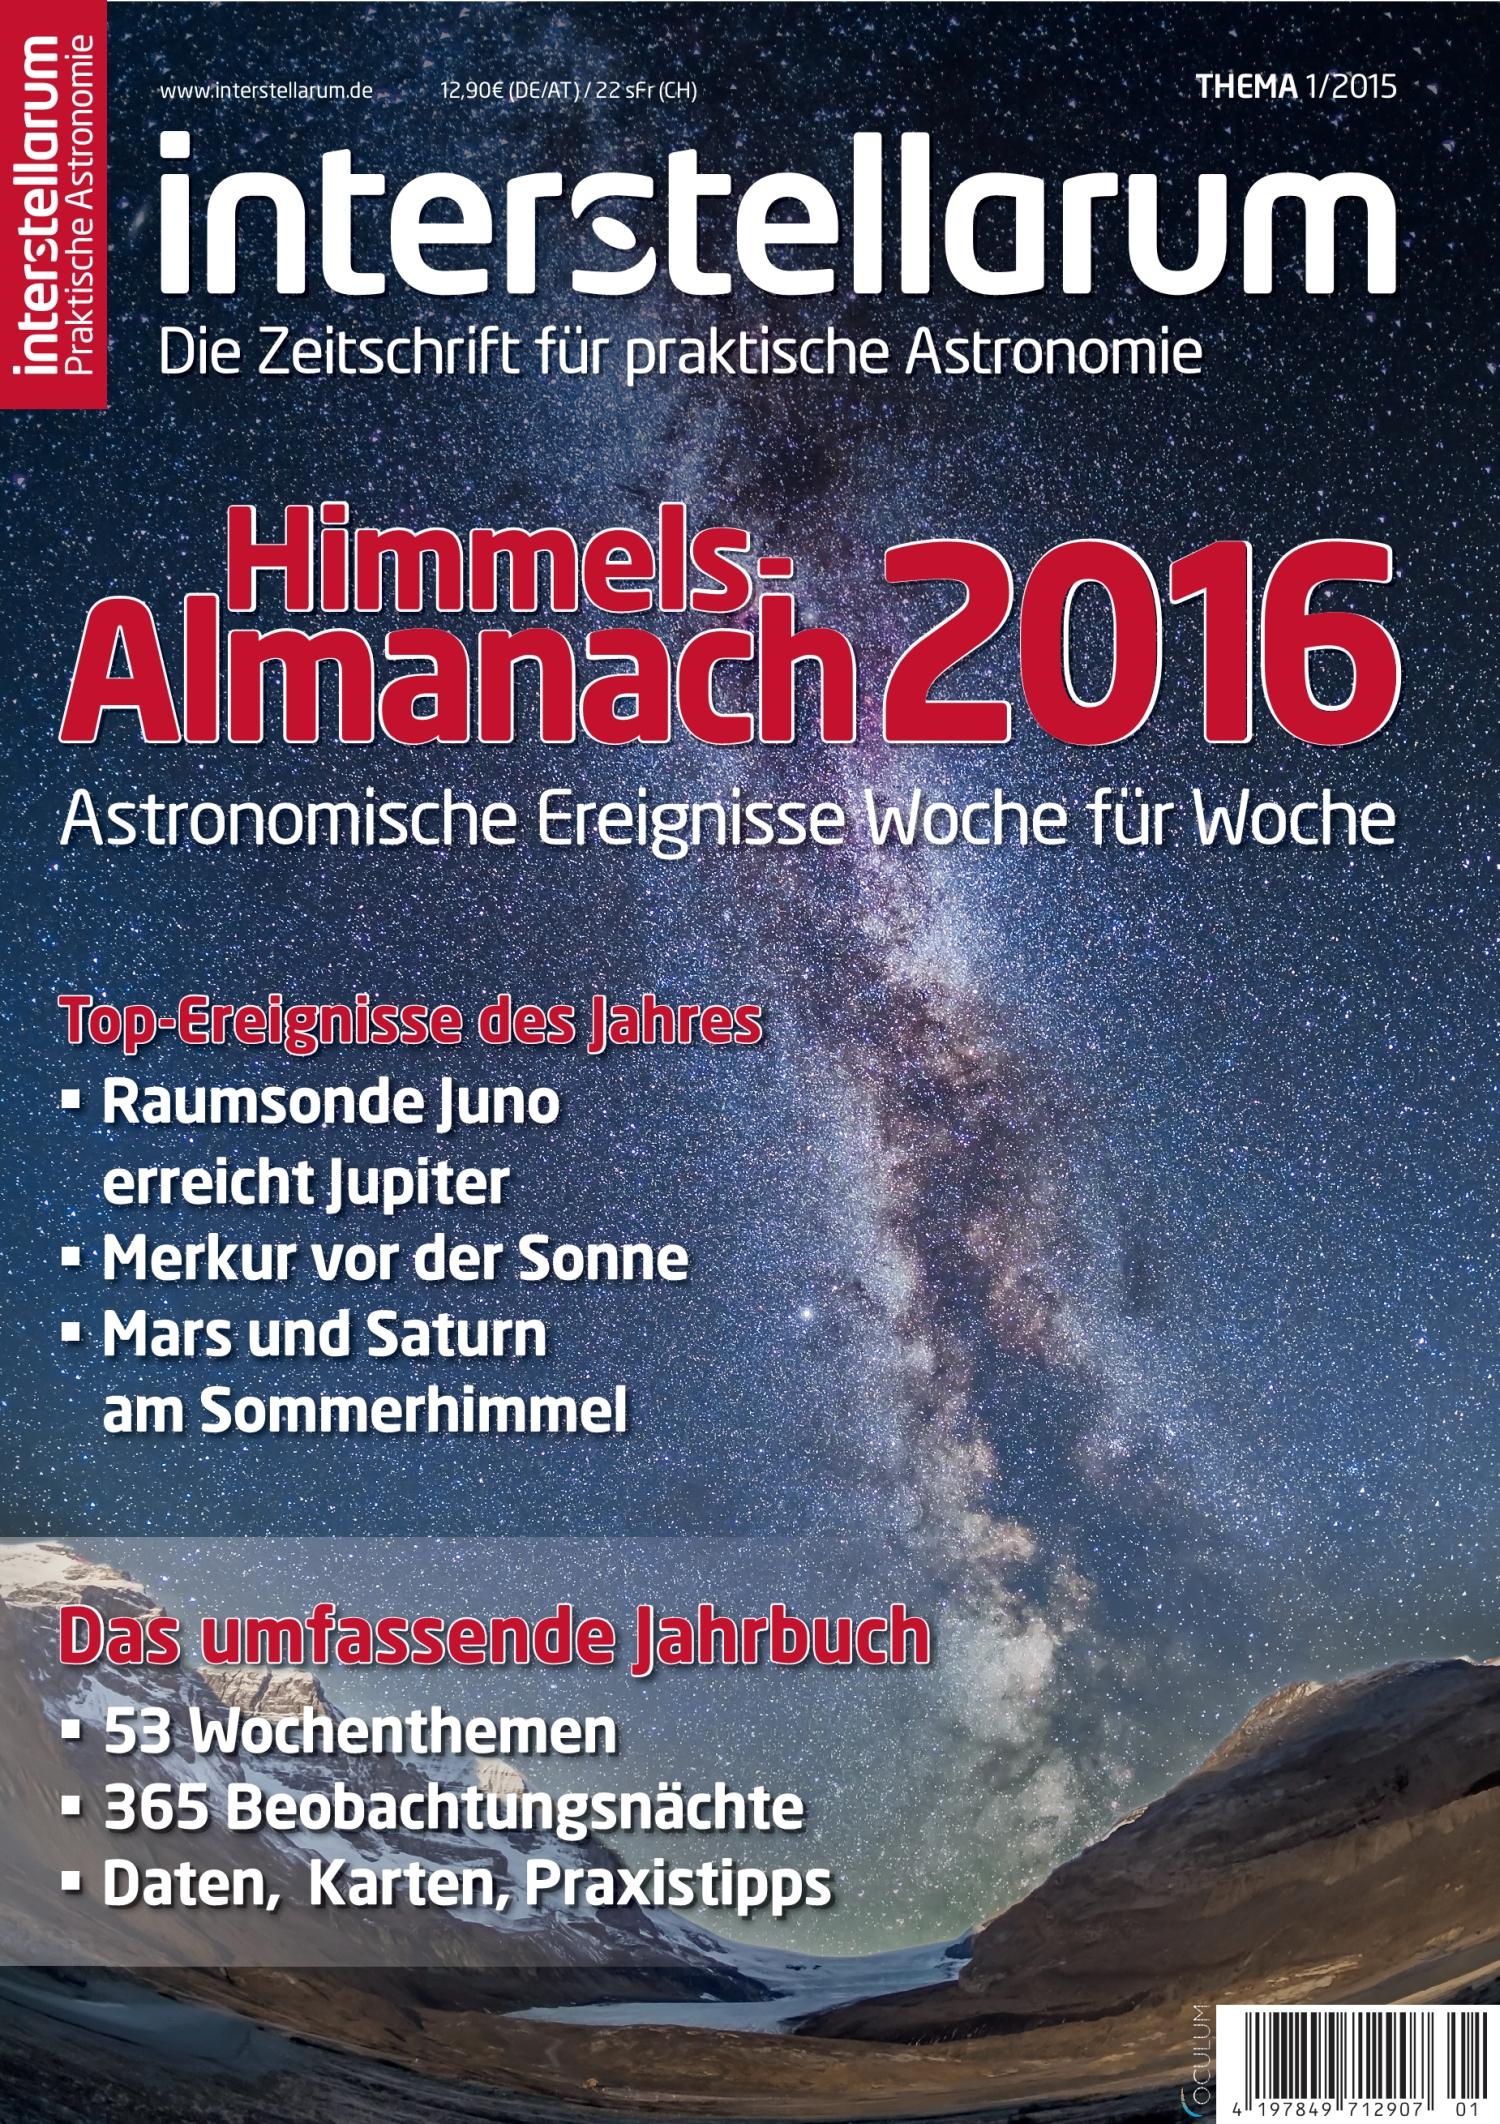 Himmels-Almanach 2016